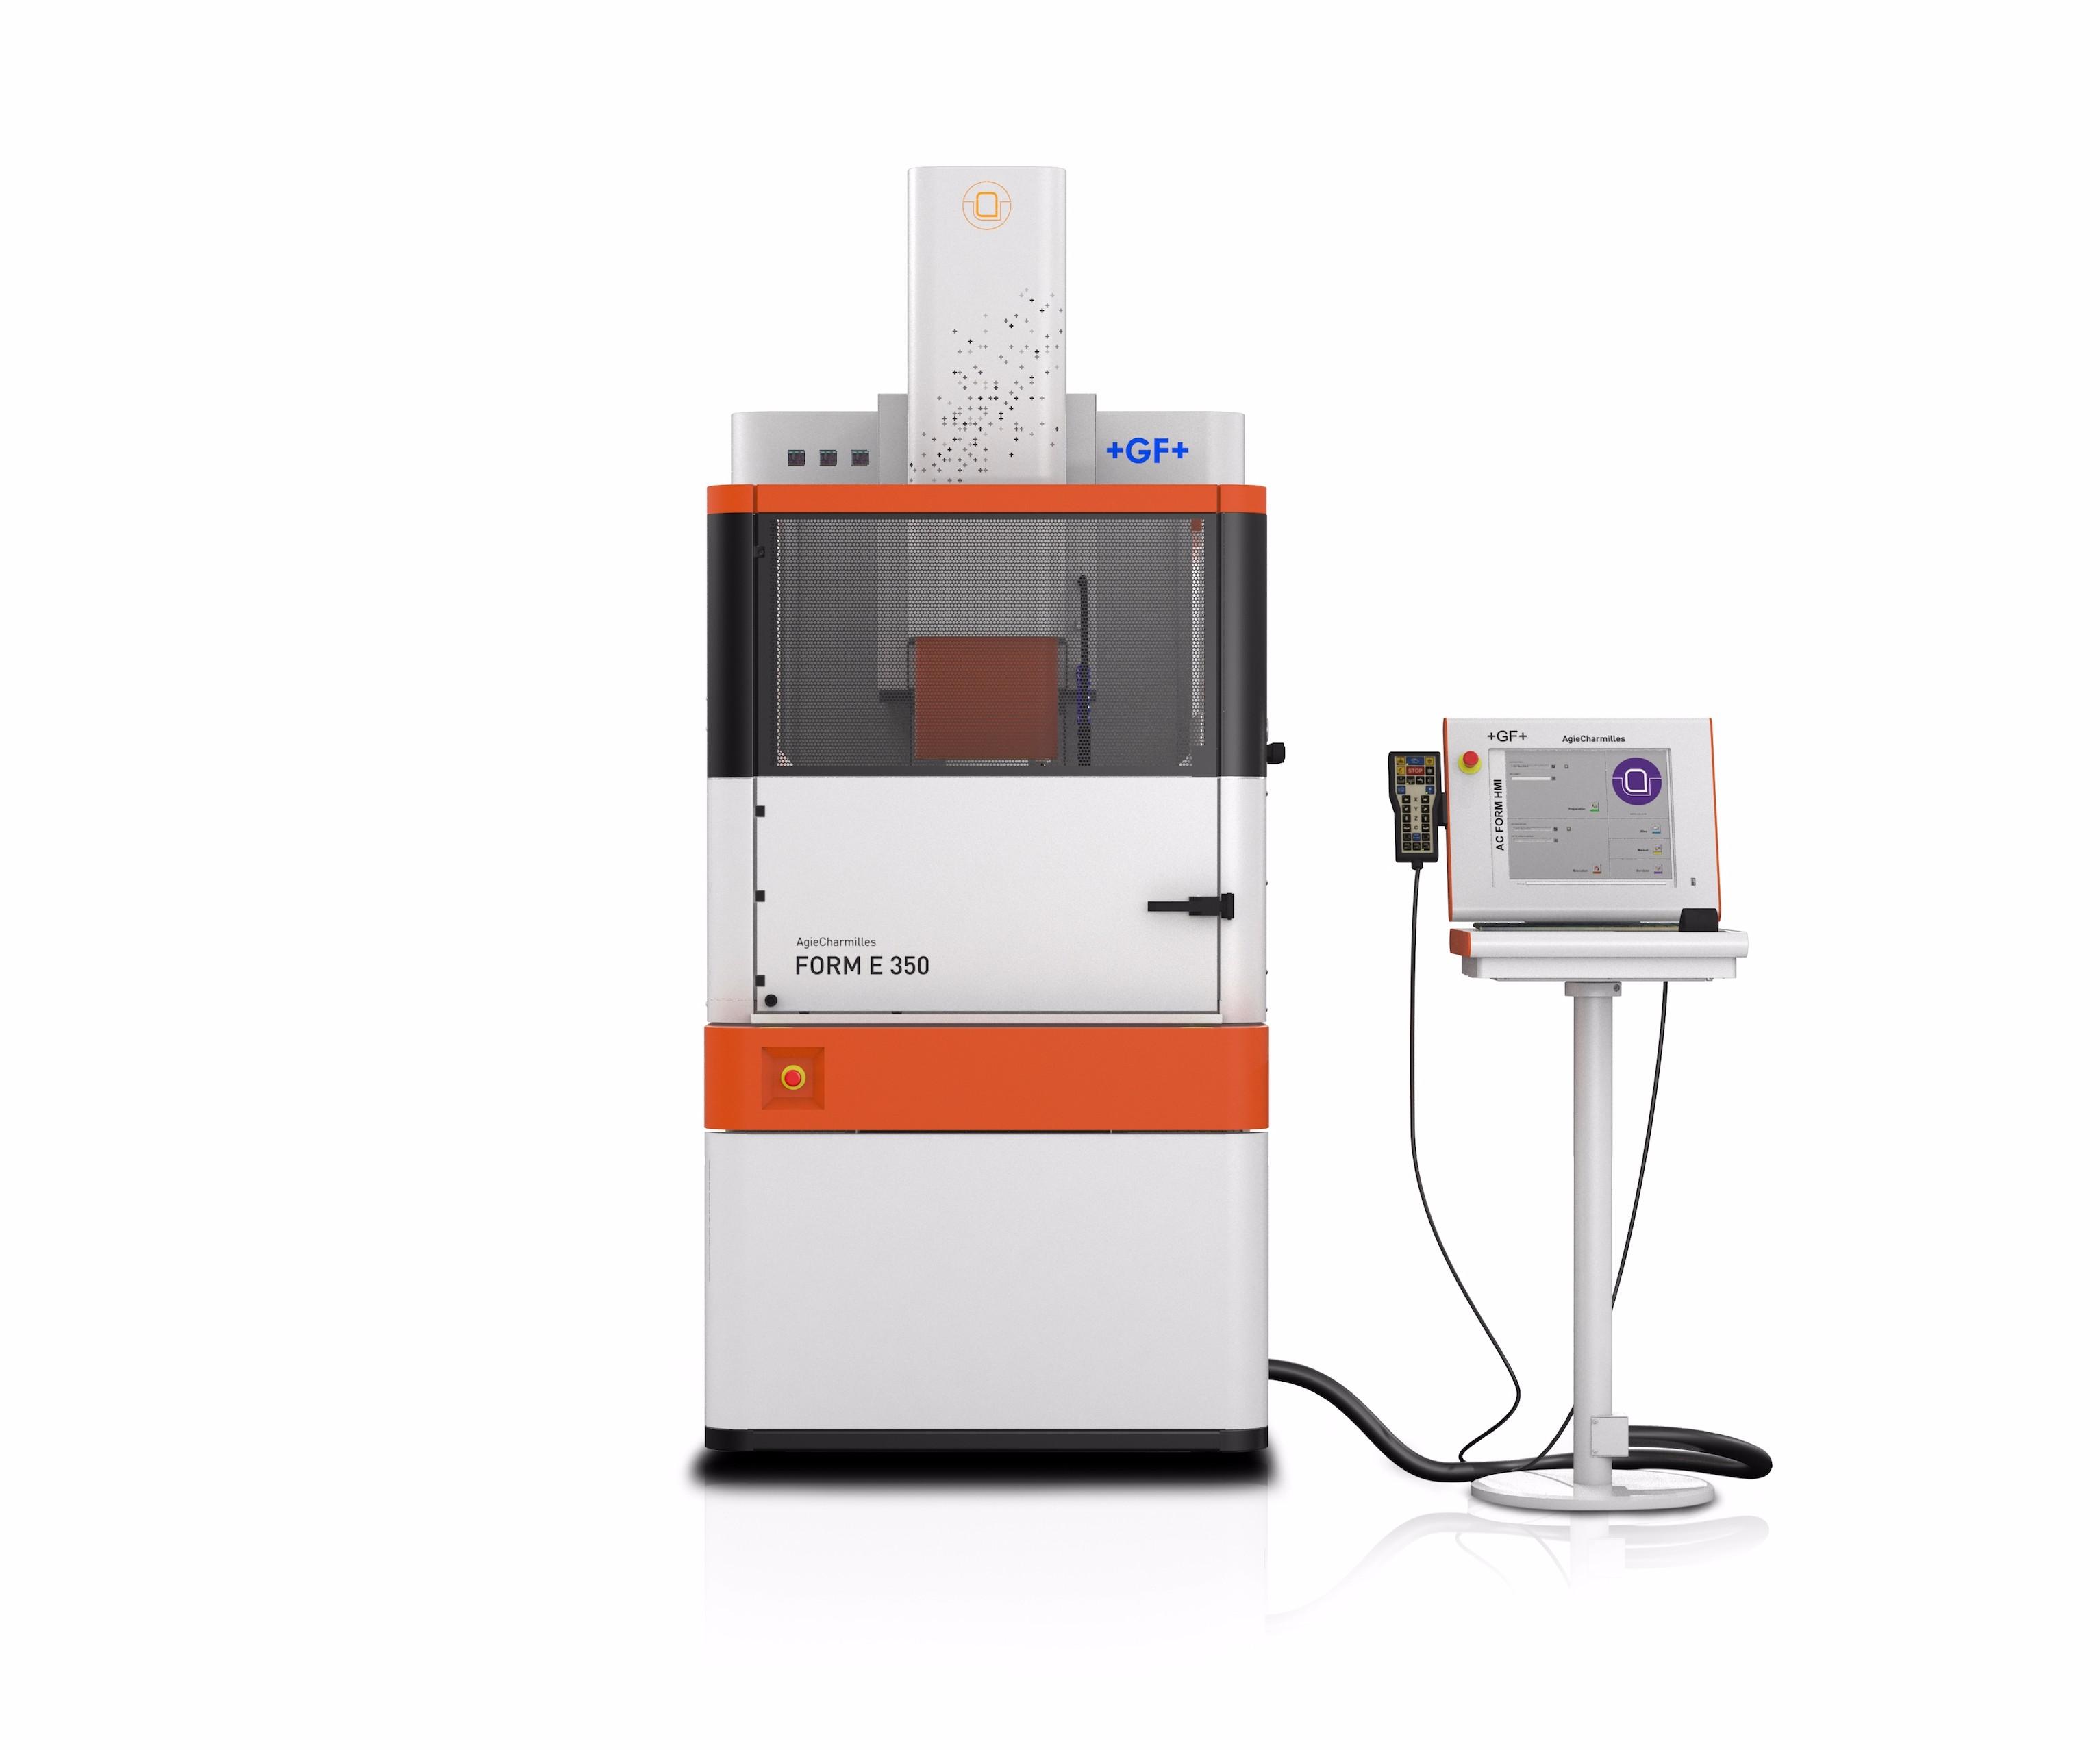 GF Machining Solutions' Form E 350